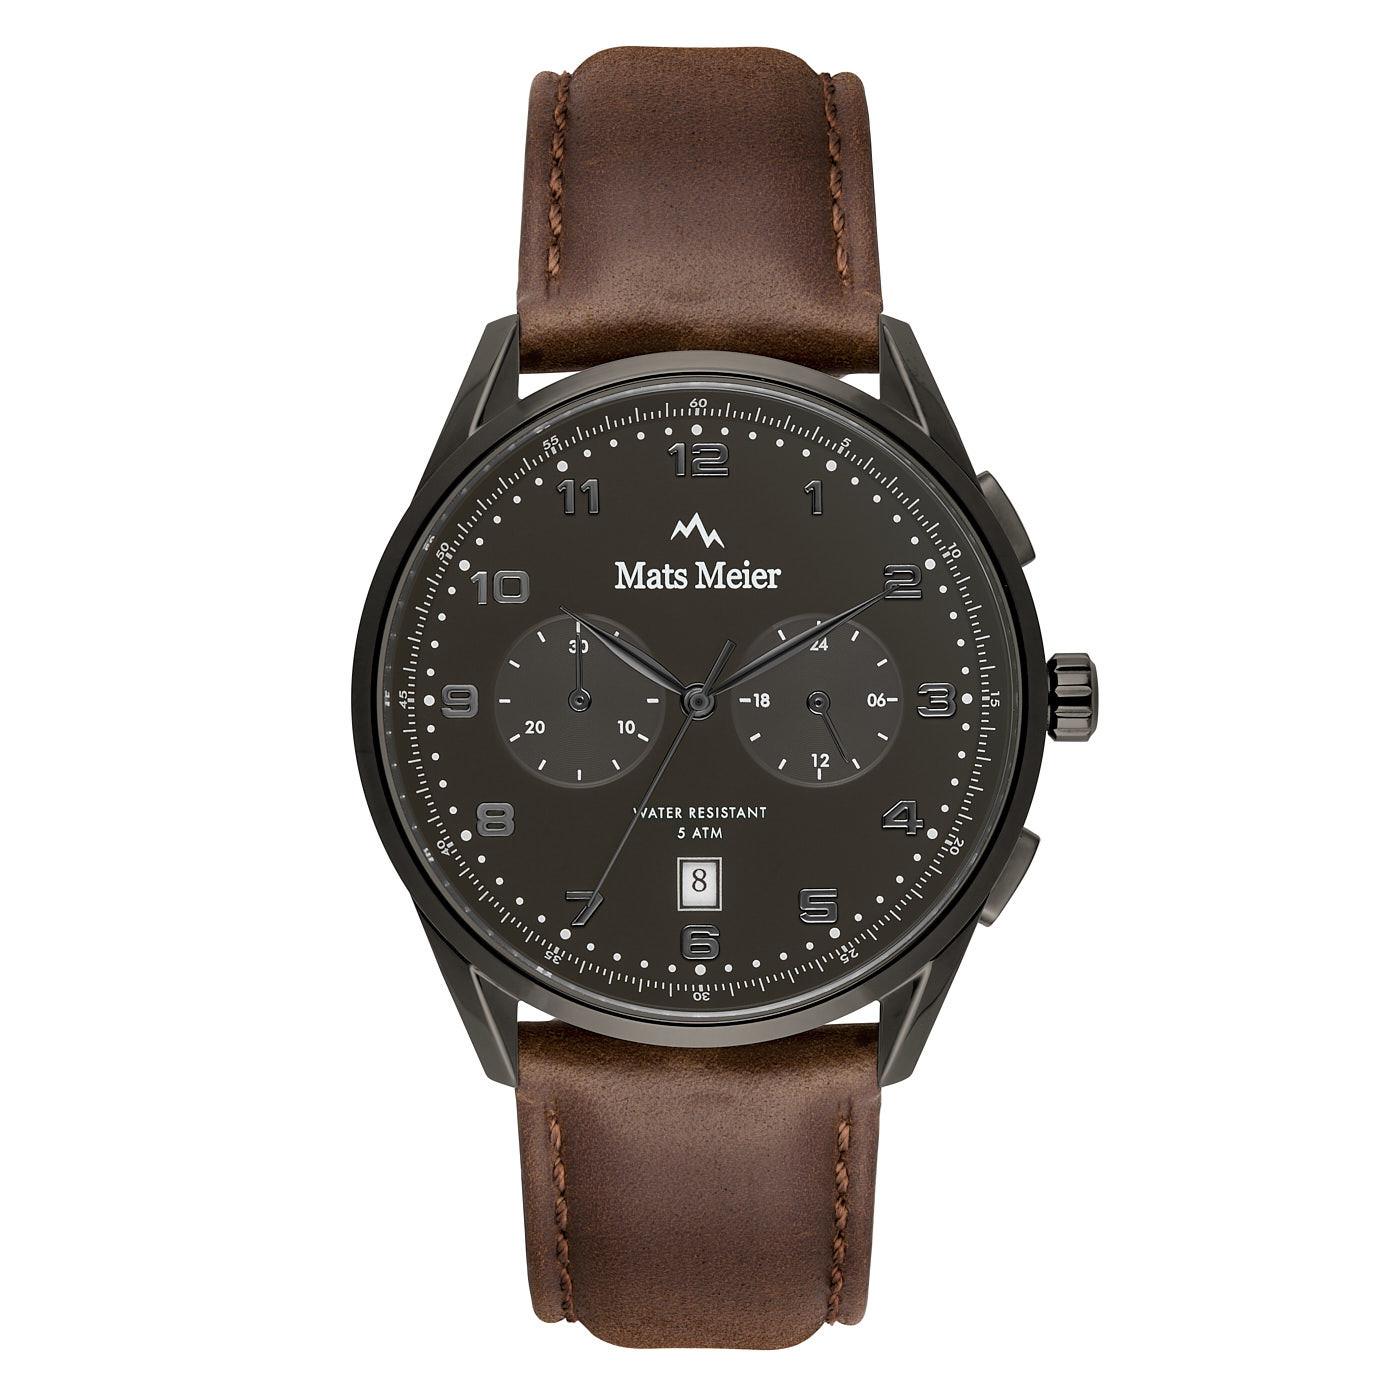 Mats Meier Mont Vélan chronographe gris / marron